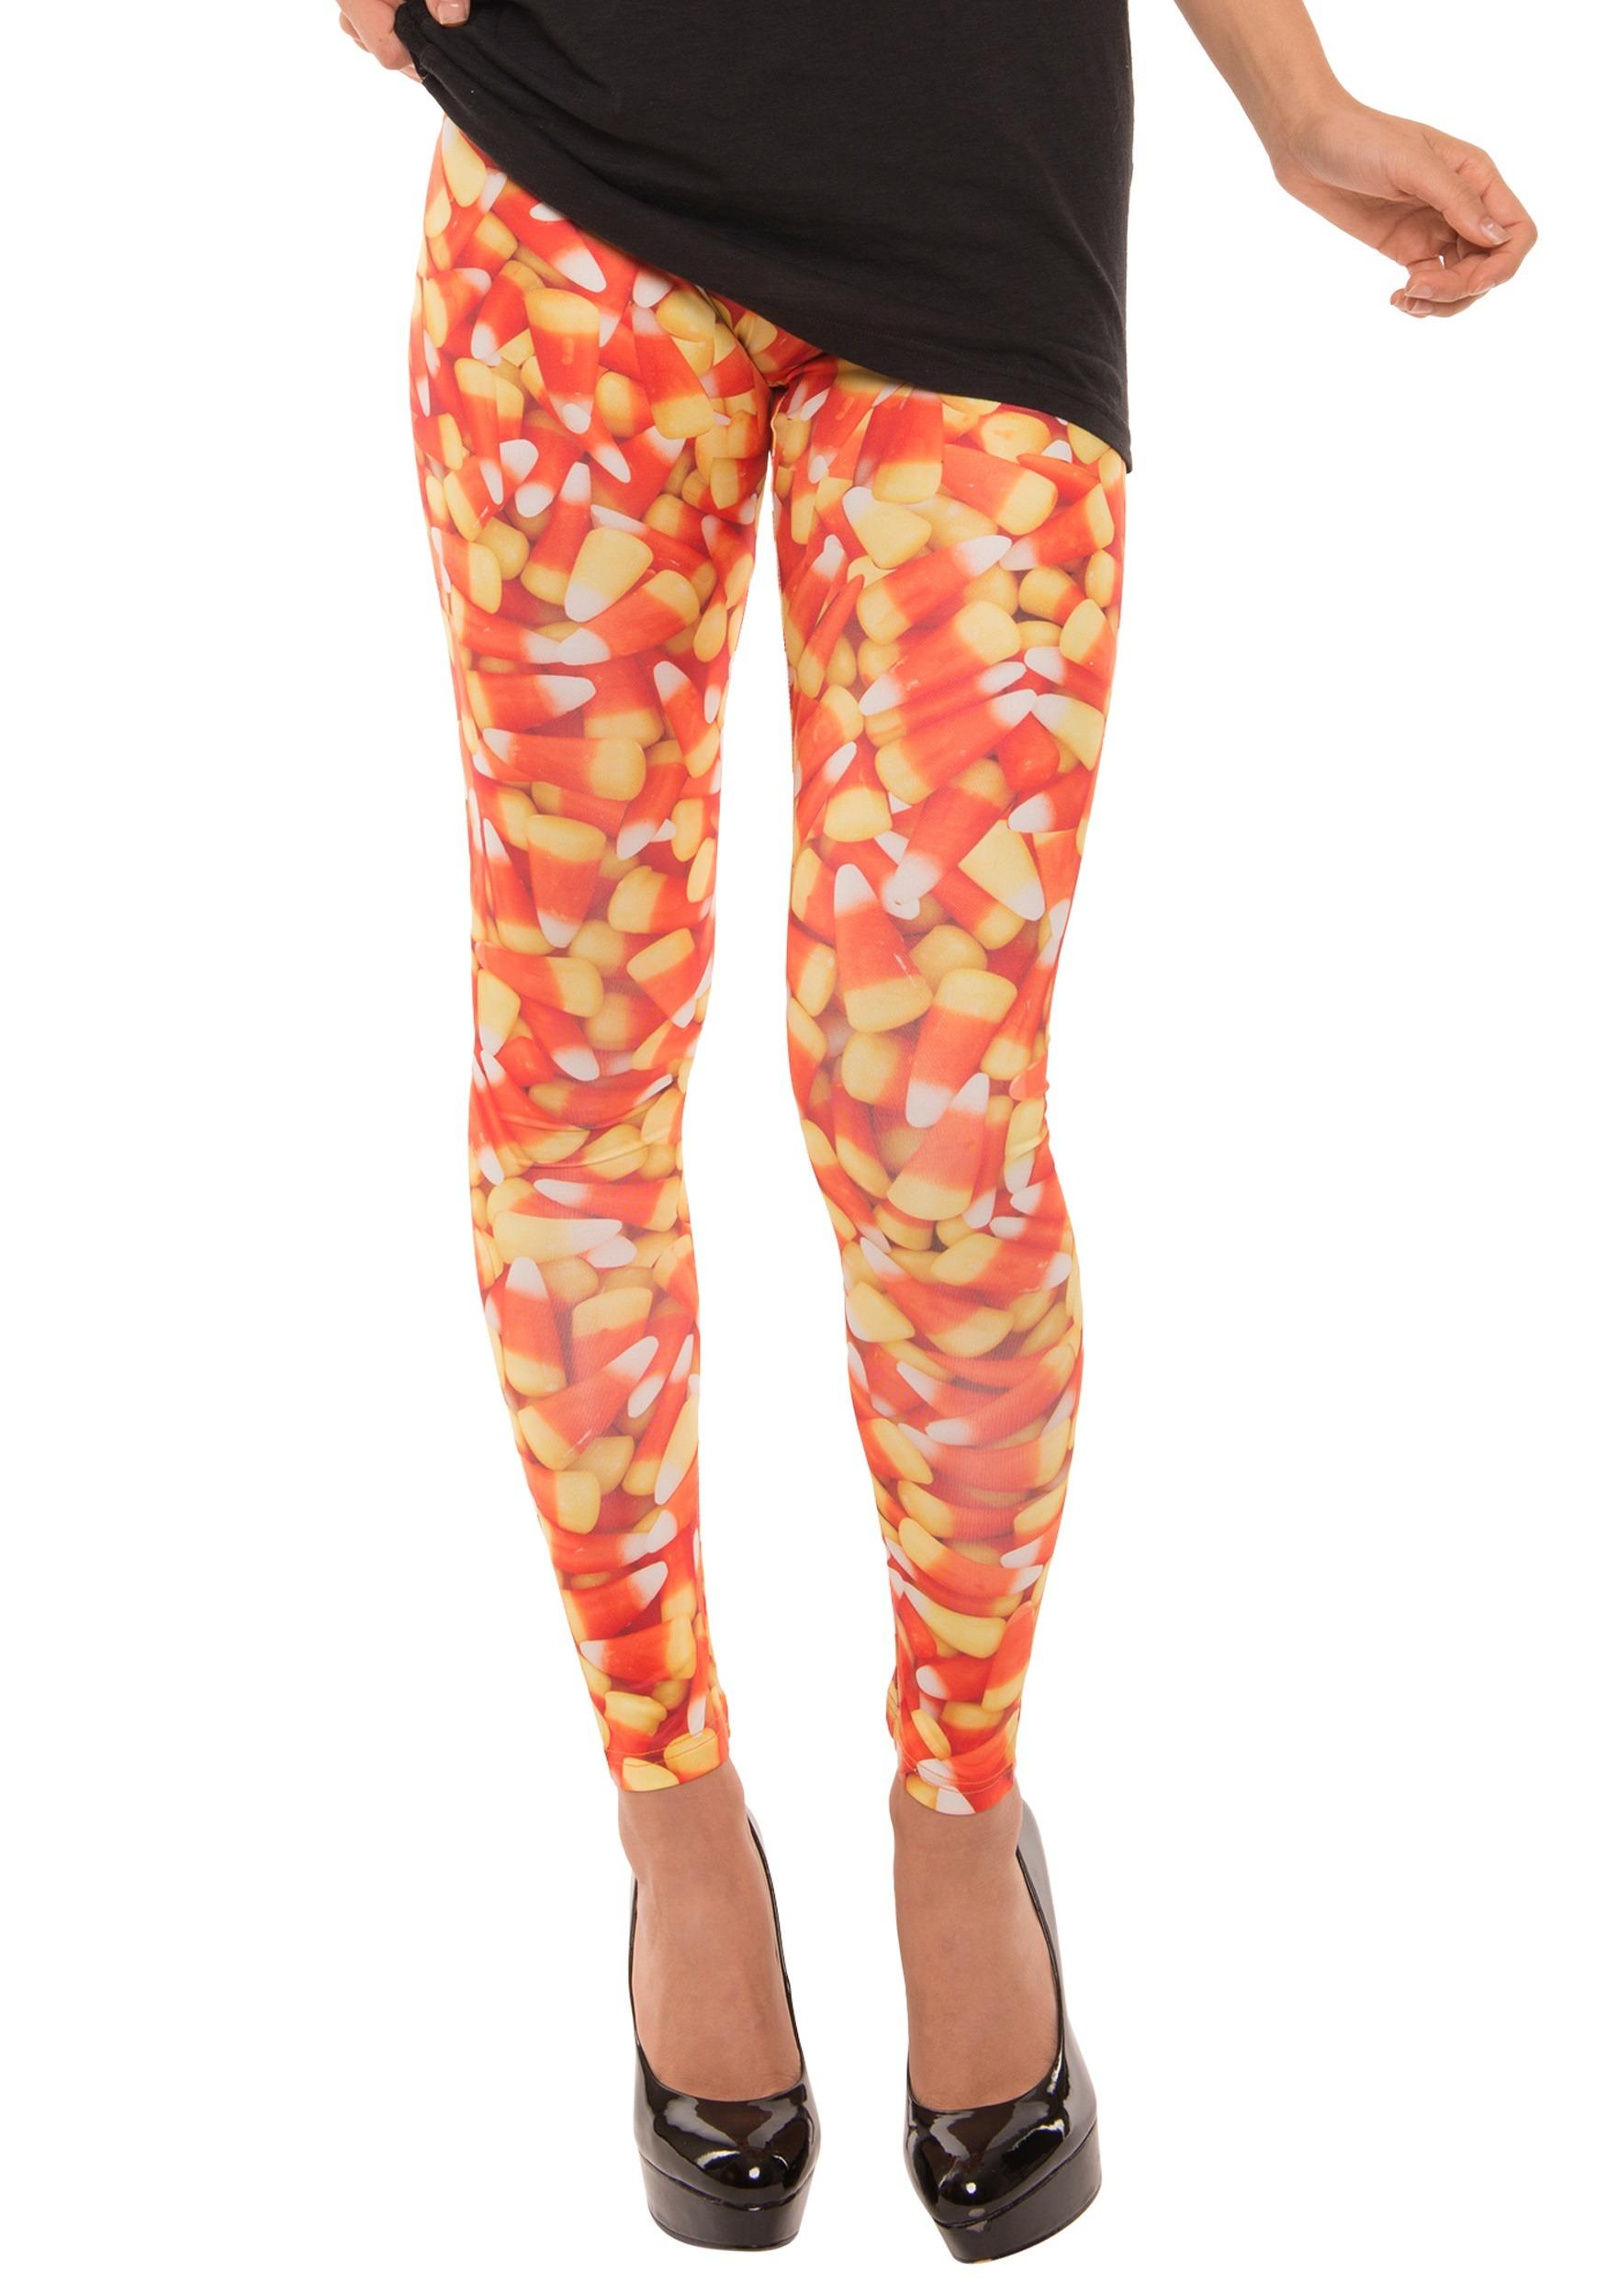 de346aa2f58e84 Women's Candy Corn Leggings